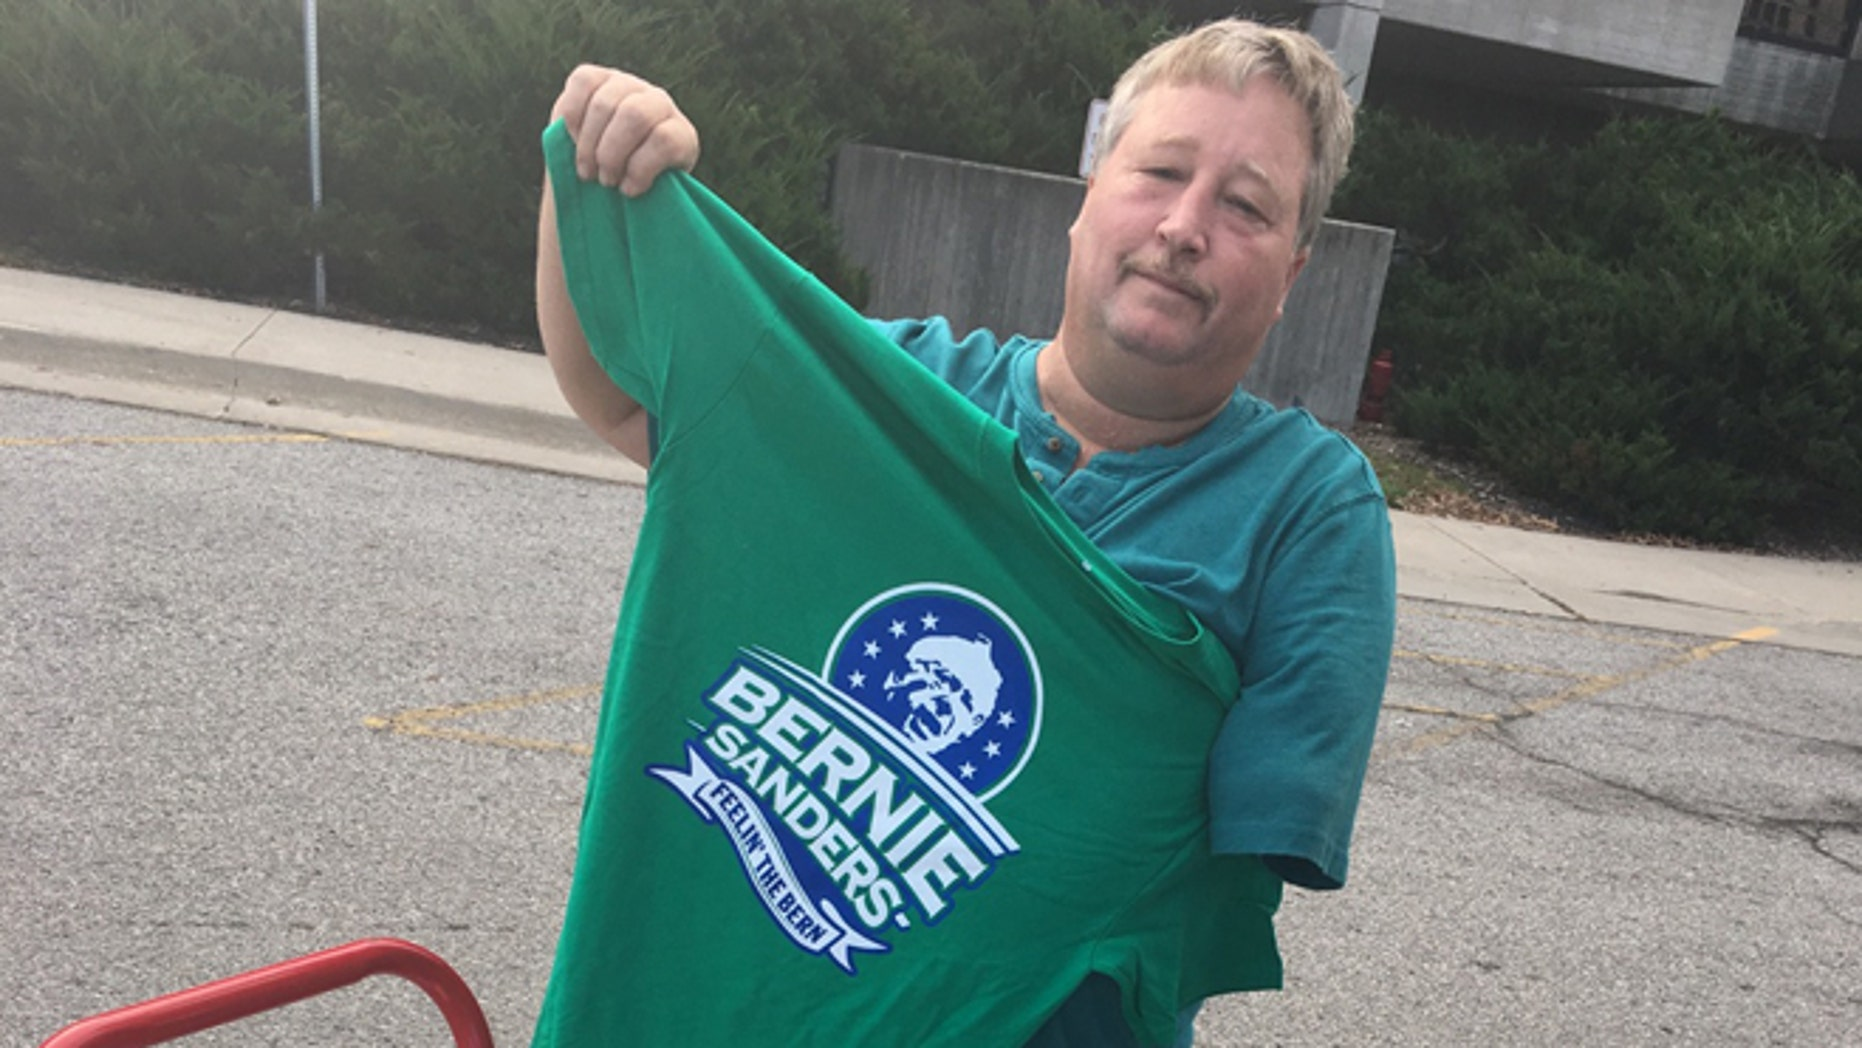 Nov. 5, 2016: Campaign merchandise salesman Daniel Richards outside of a Hillary Clinton rally headlined by Bernie Sanders, Ames, Iowa. Photo by Chris Hibben for Fox News.